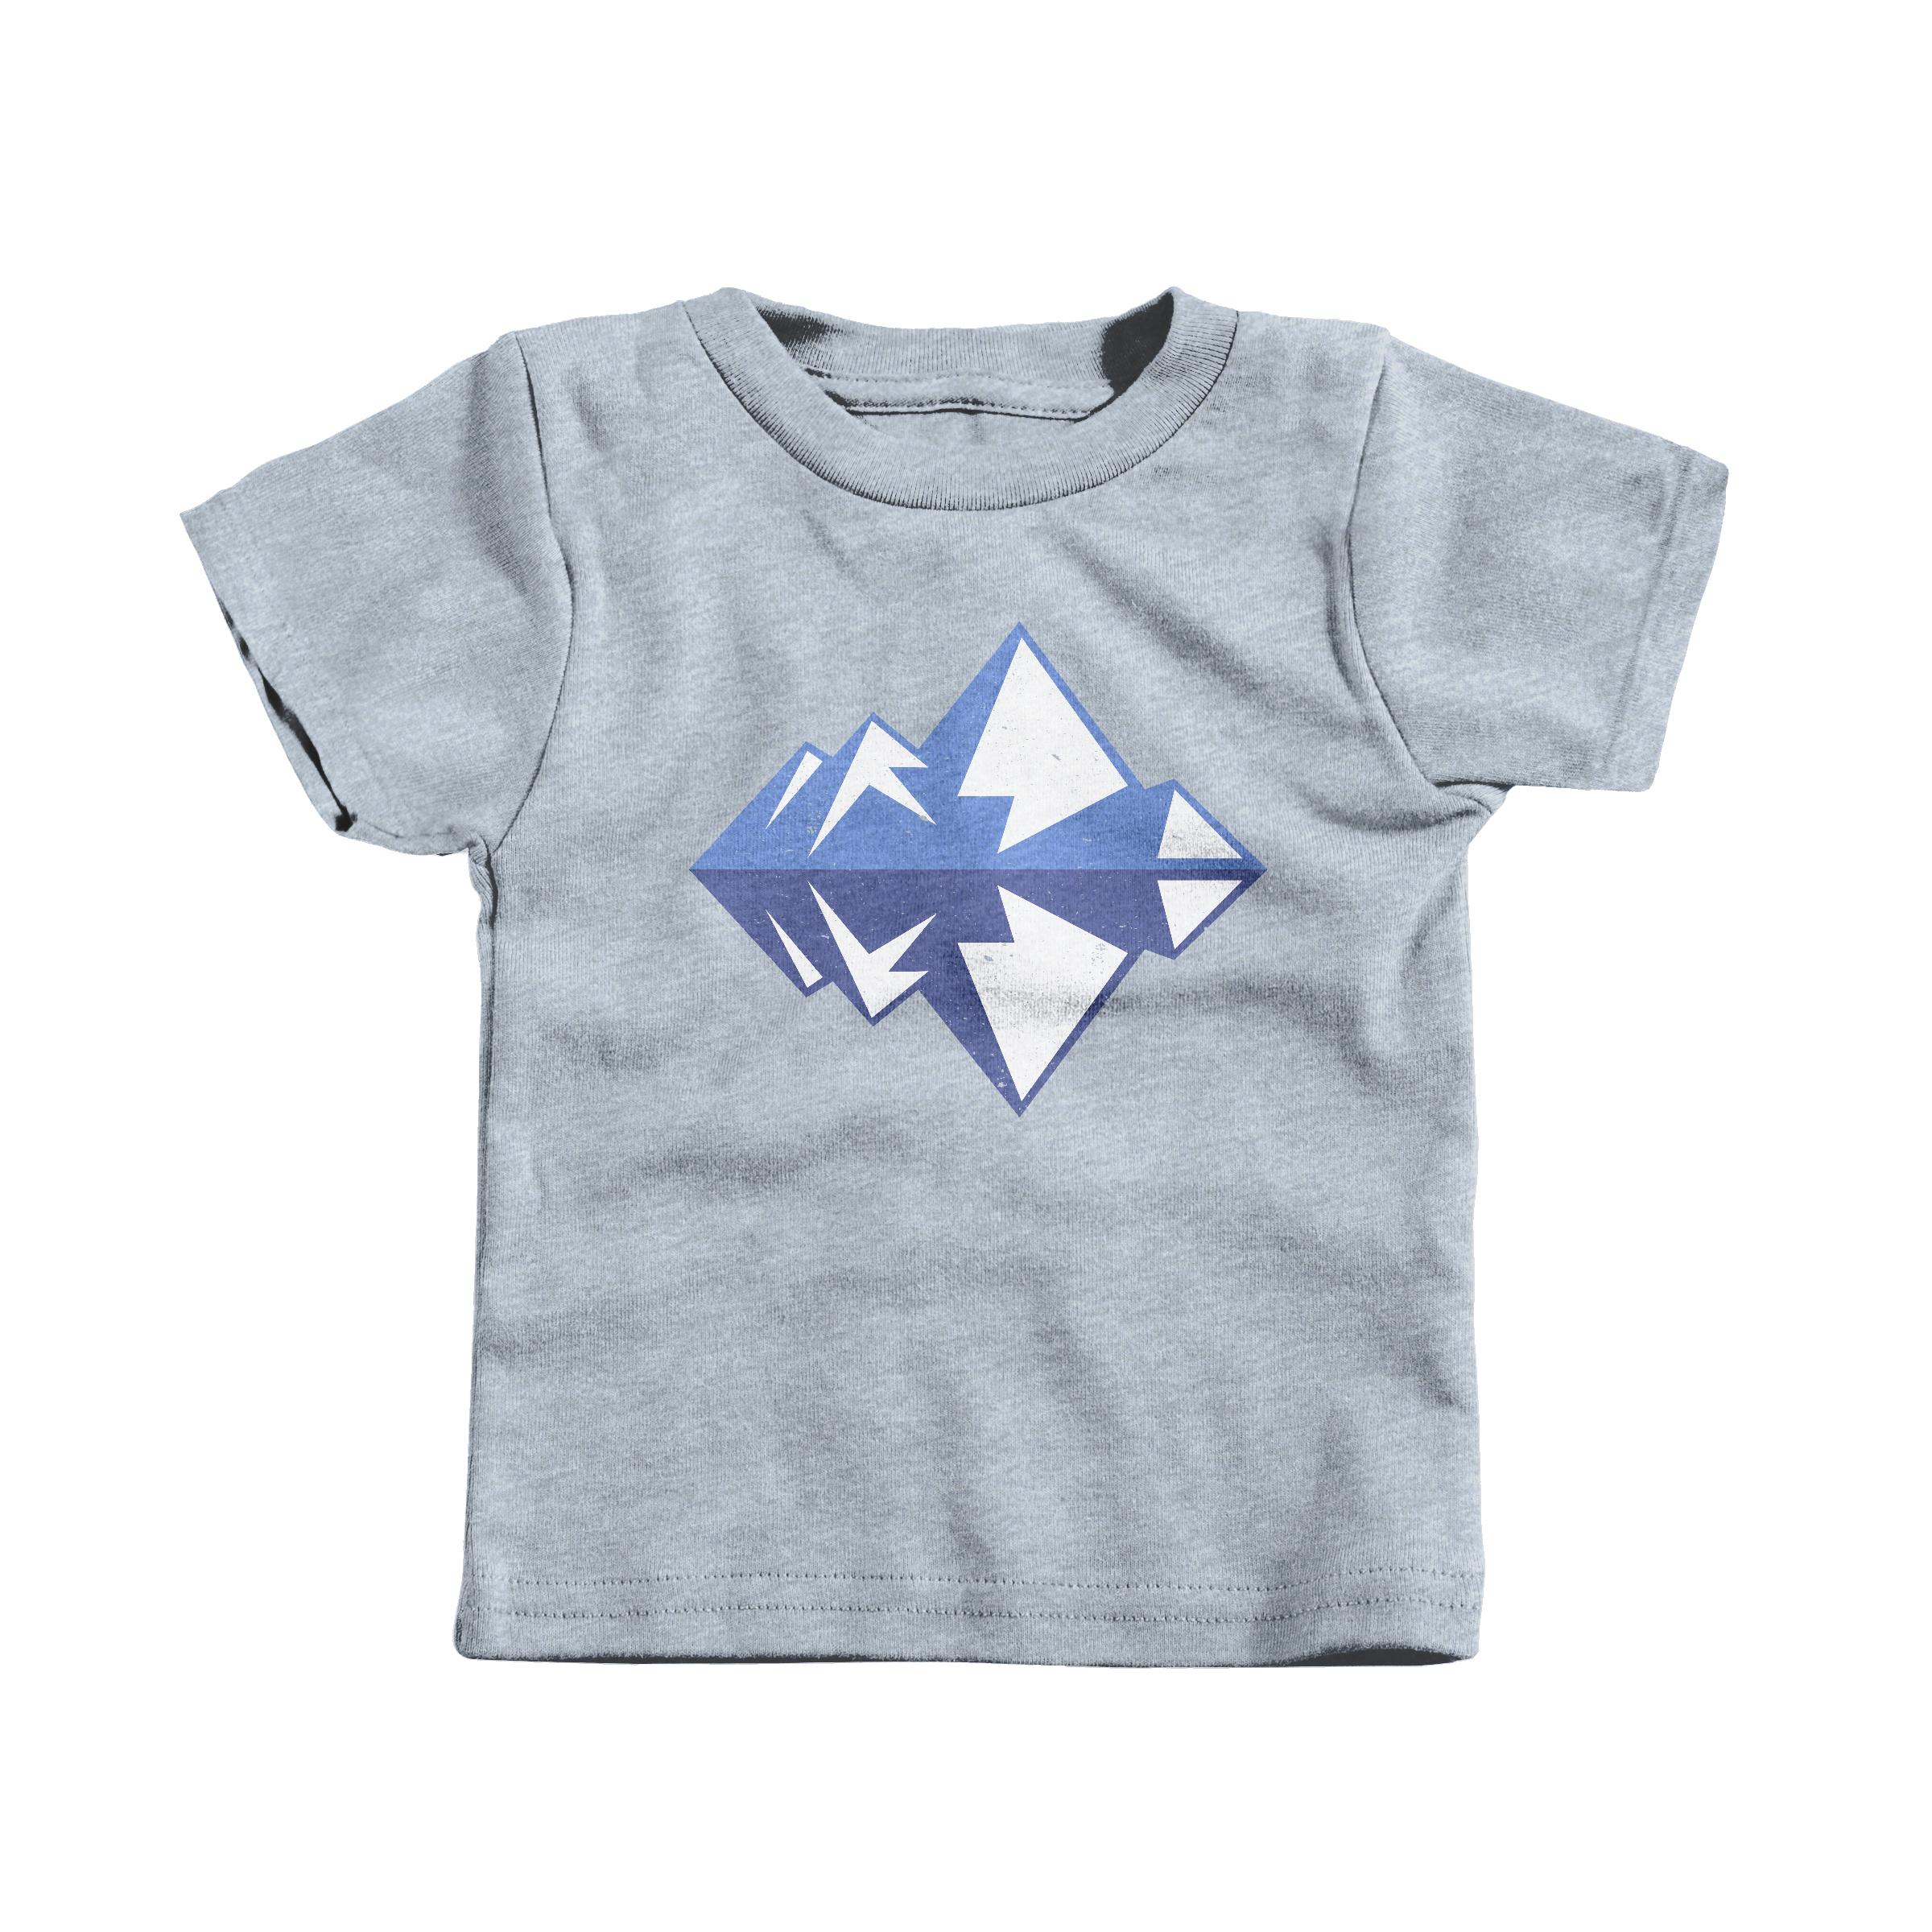 Reflection Heather Grey (T-Shirt)